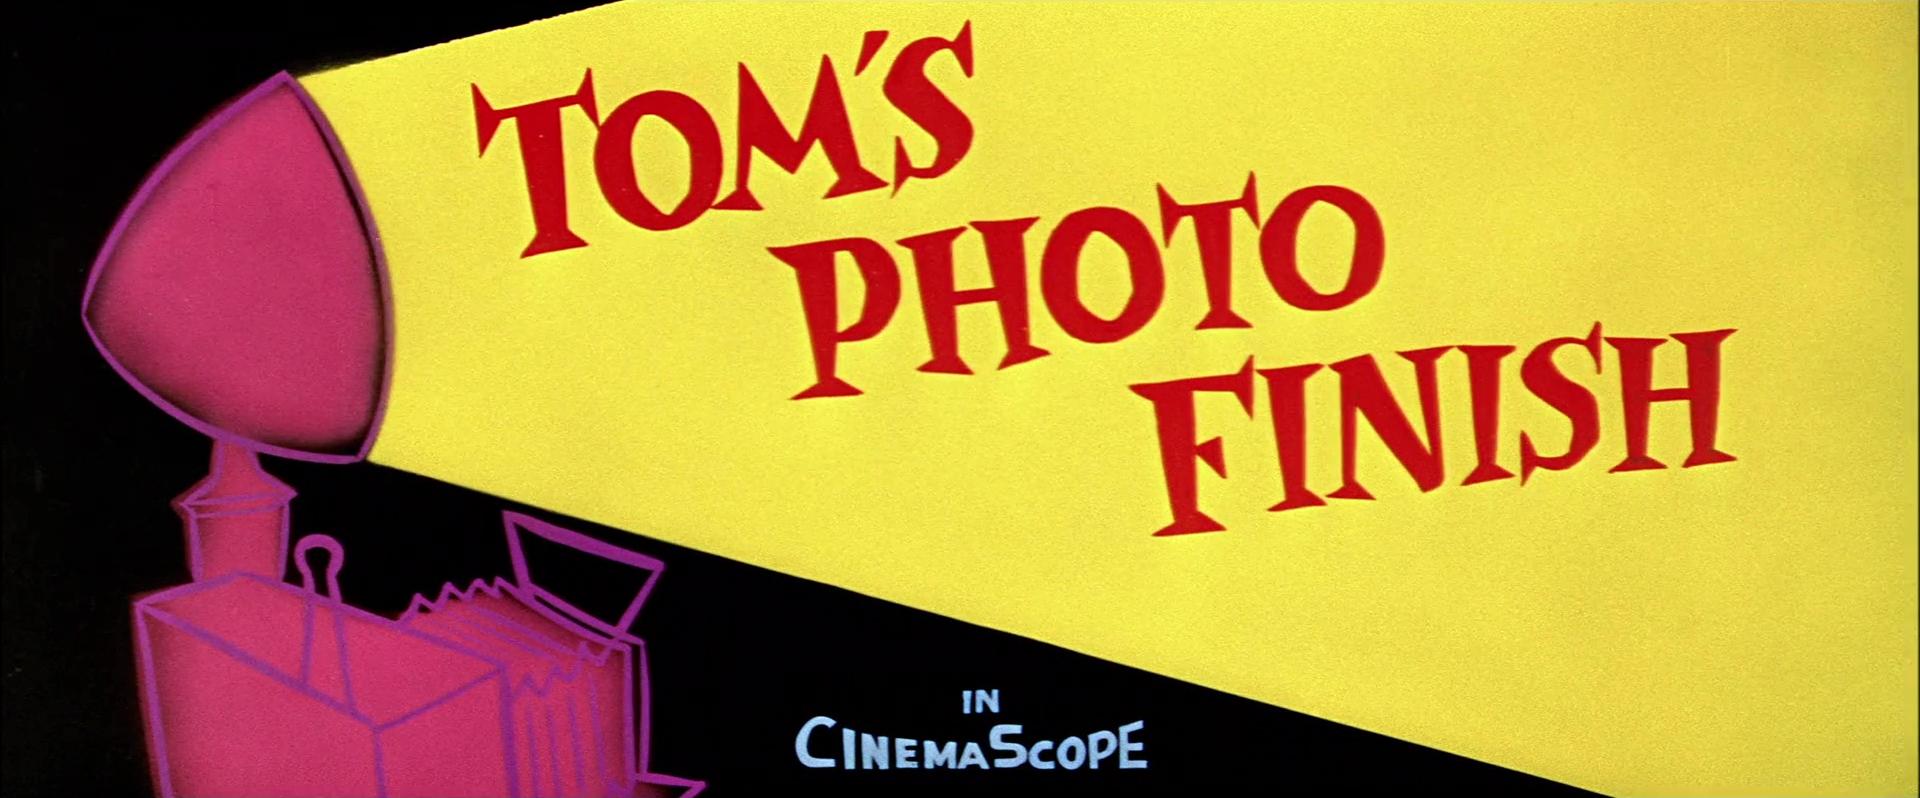 Tom S Photo Finish Tom And Jerry Wiki Fandom Powered